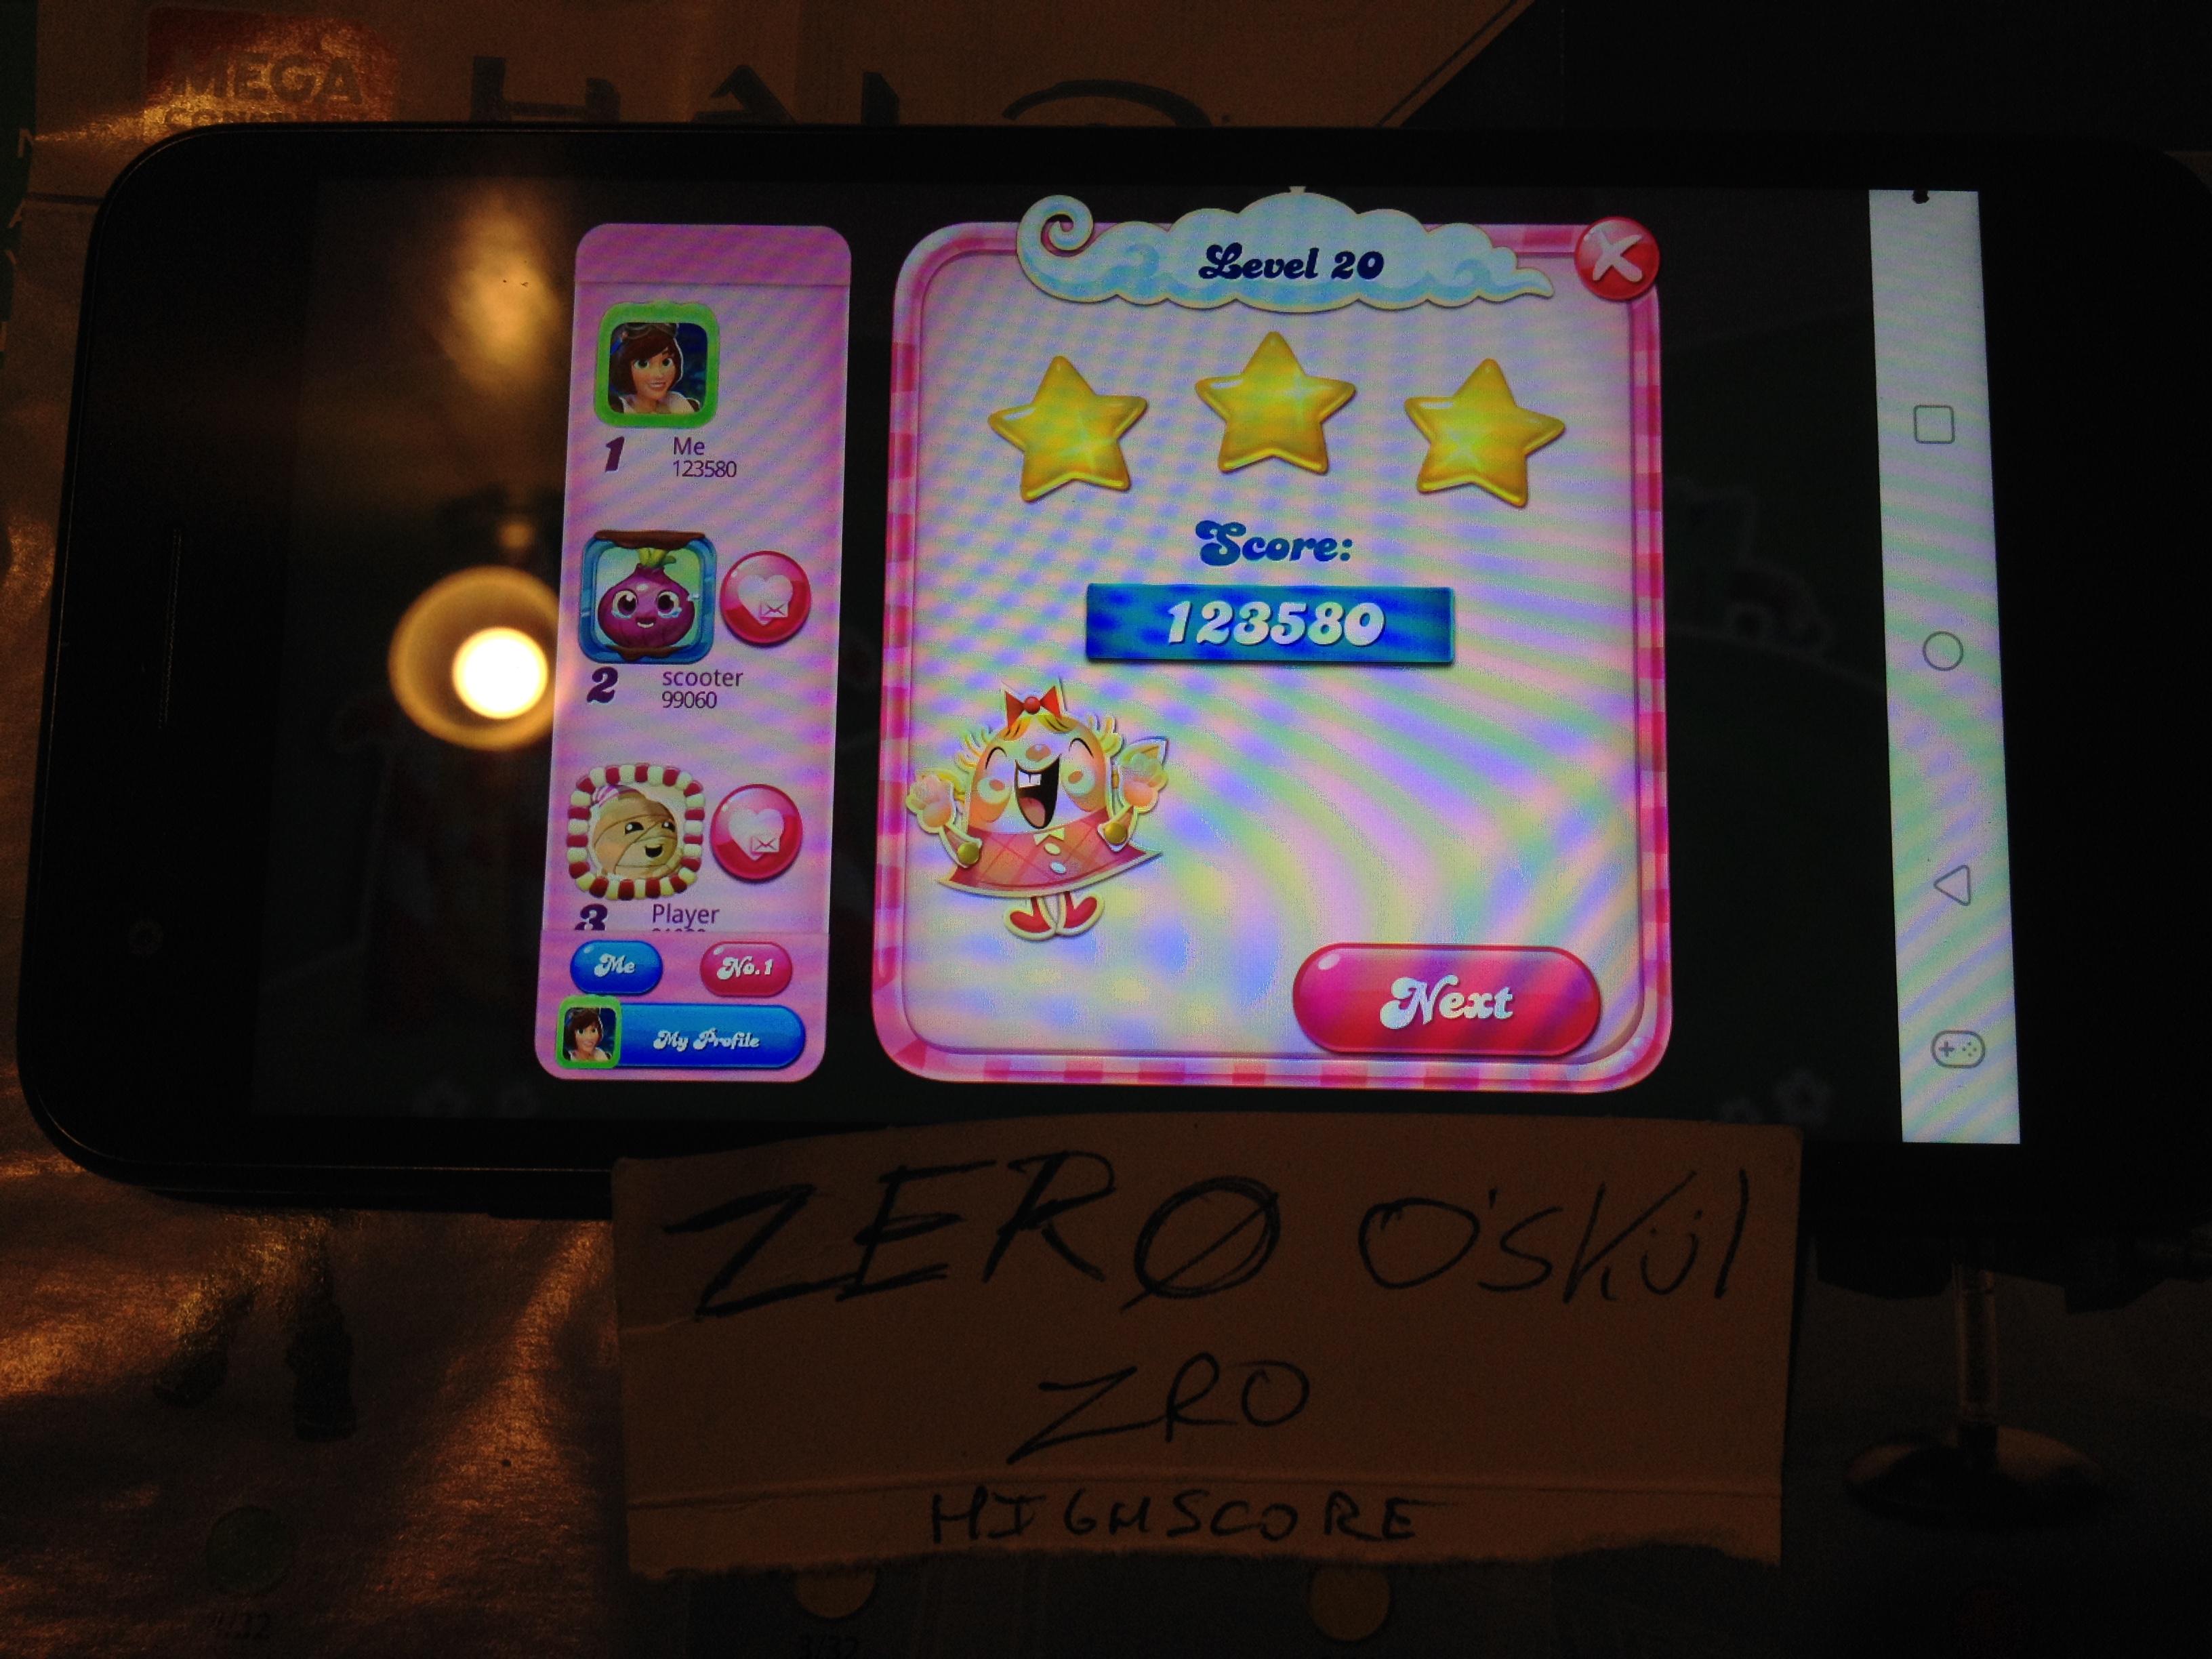 zerooskul: Candy Crush Saga: Level 020 (Android) 123,580 points on 2020-10-17 01:13:44